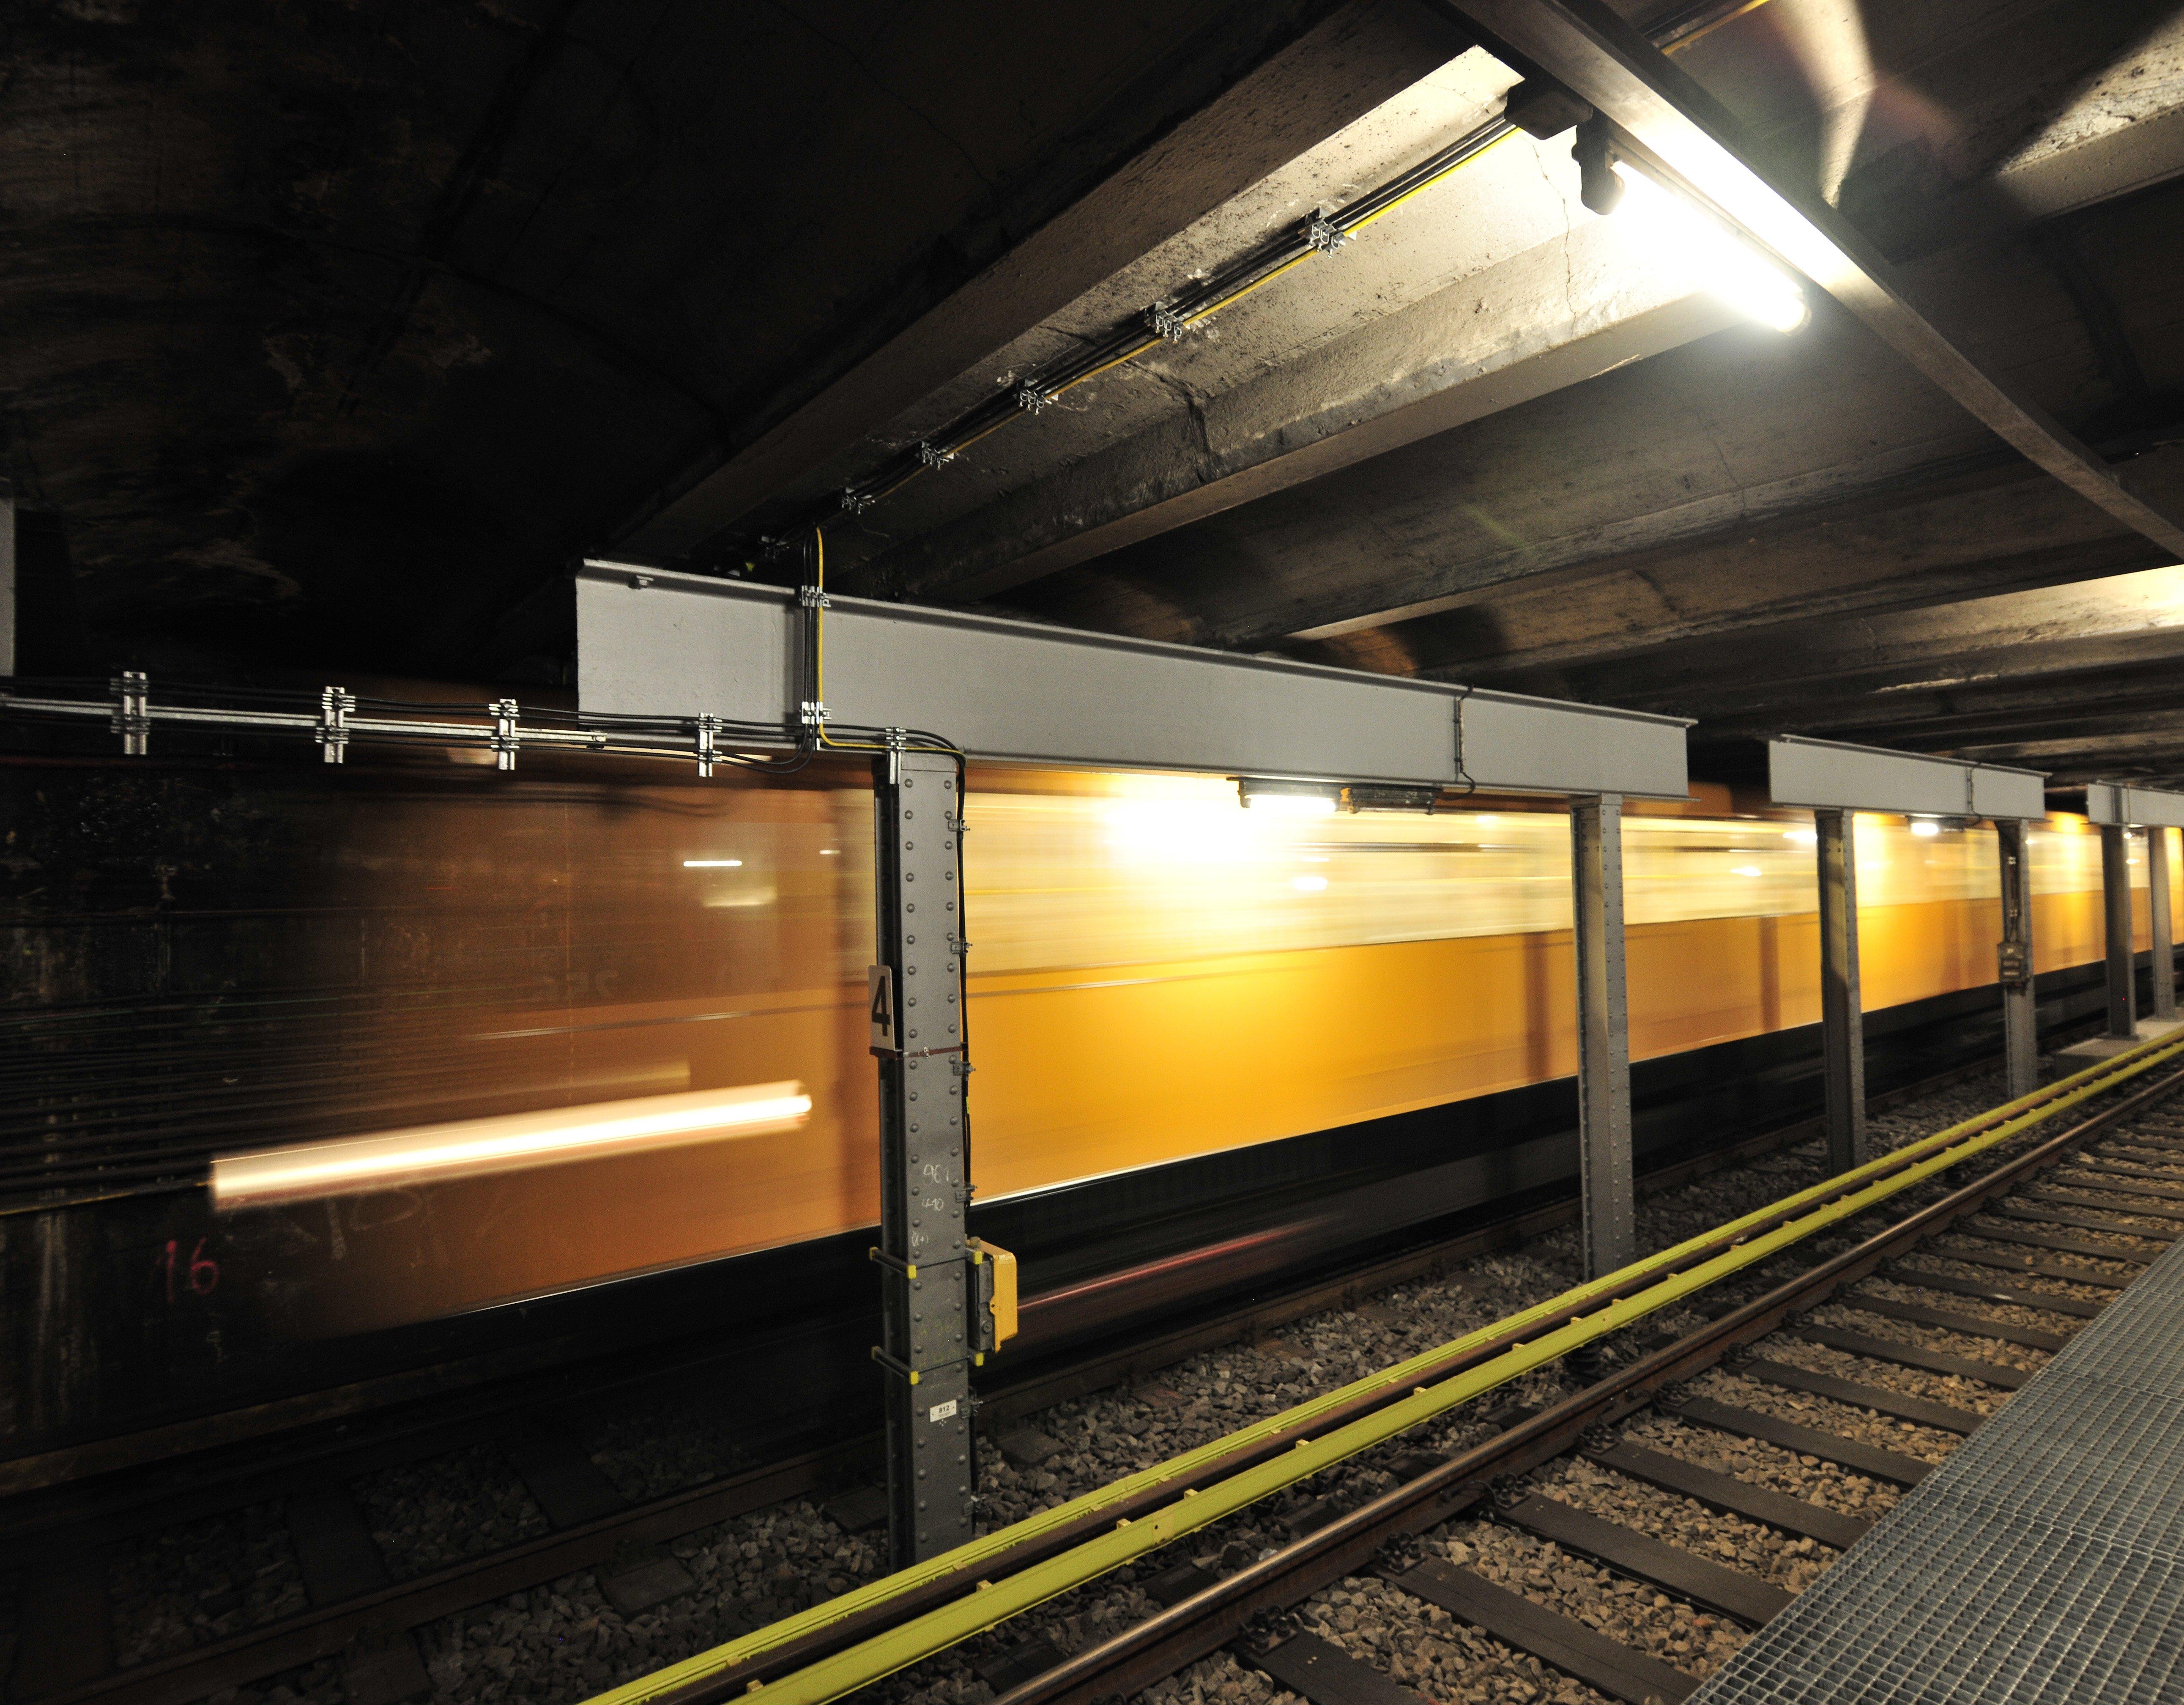 BVG_Sven_Lambert- Berlin - transport - metro